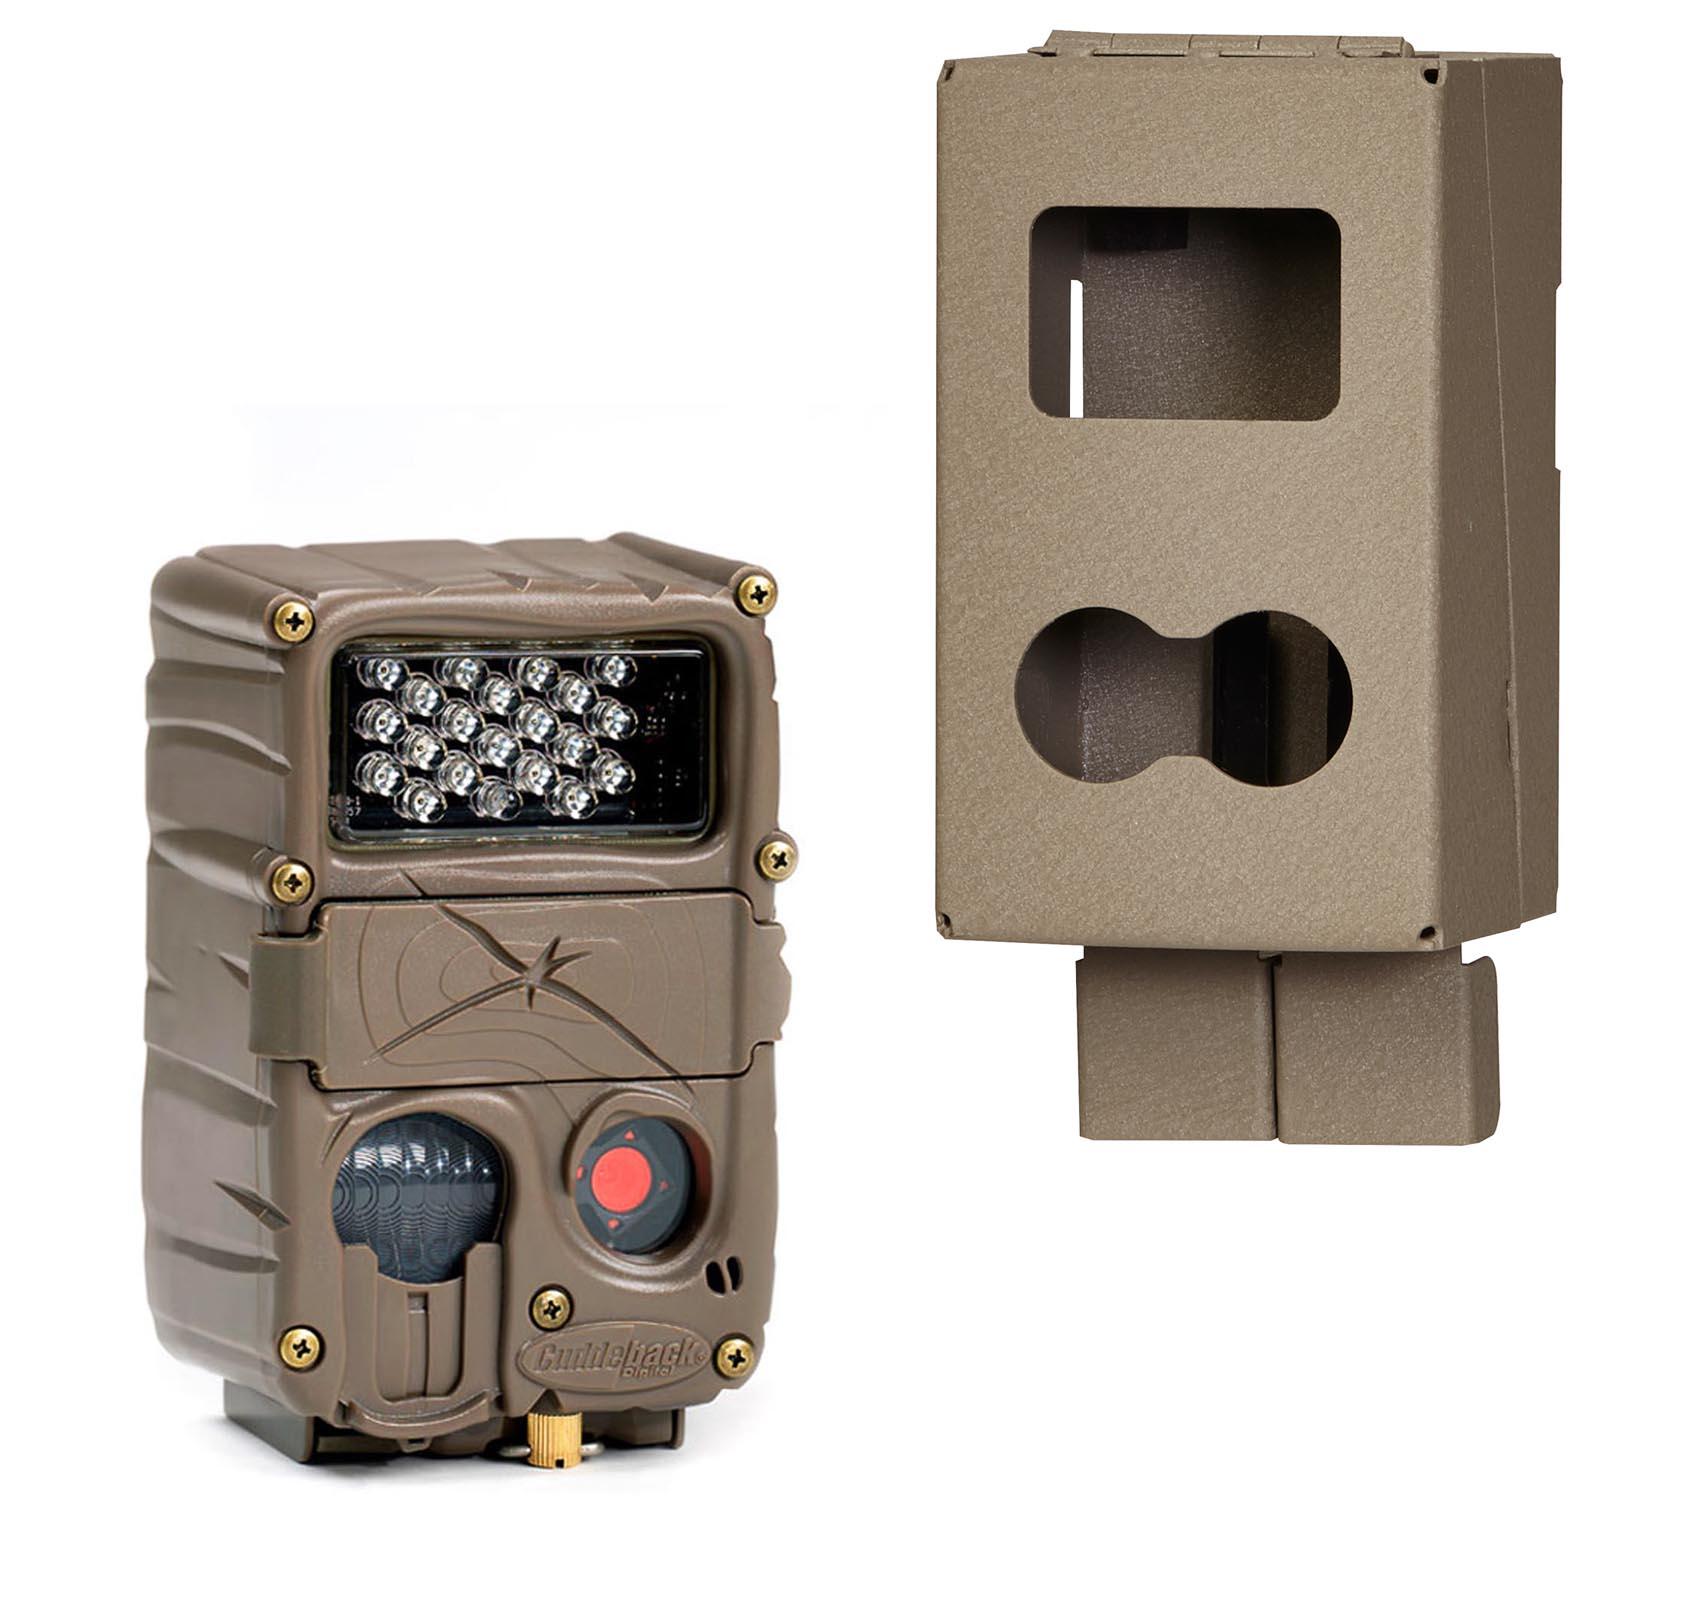 CUDDEBACK Model E2 Long Range IR Infrared Micro 20MP Game Hunting Camera w/ Case